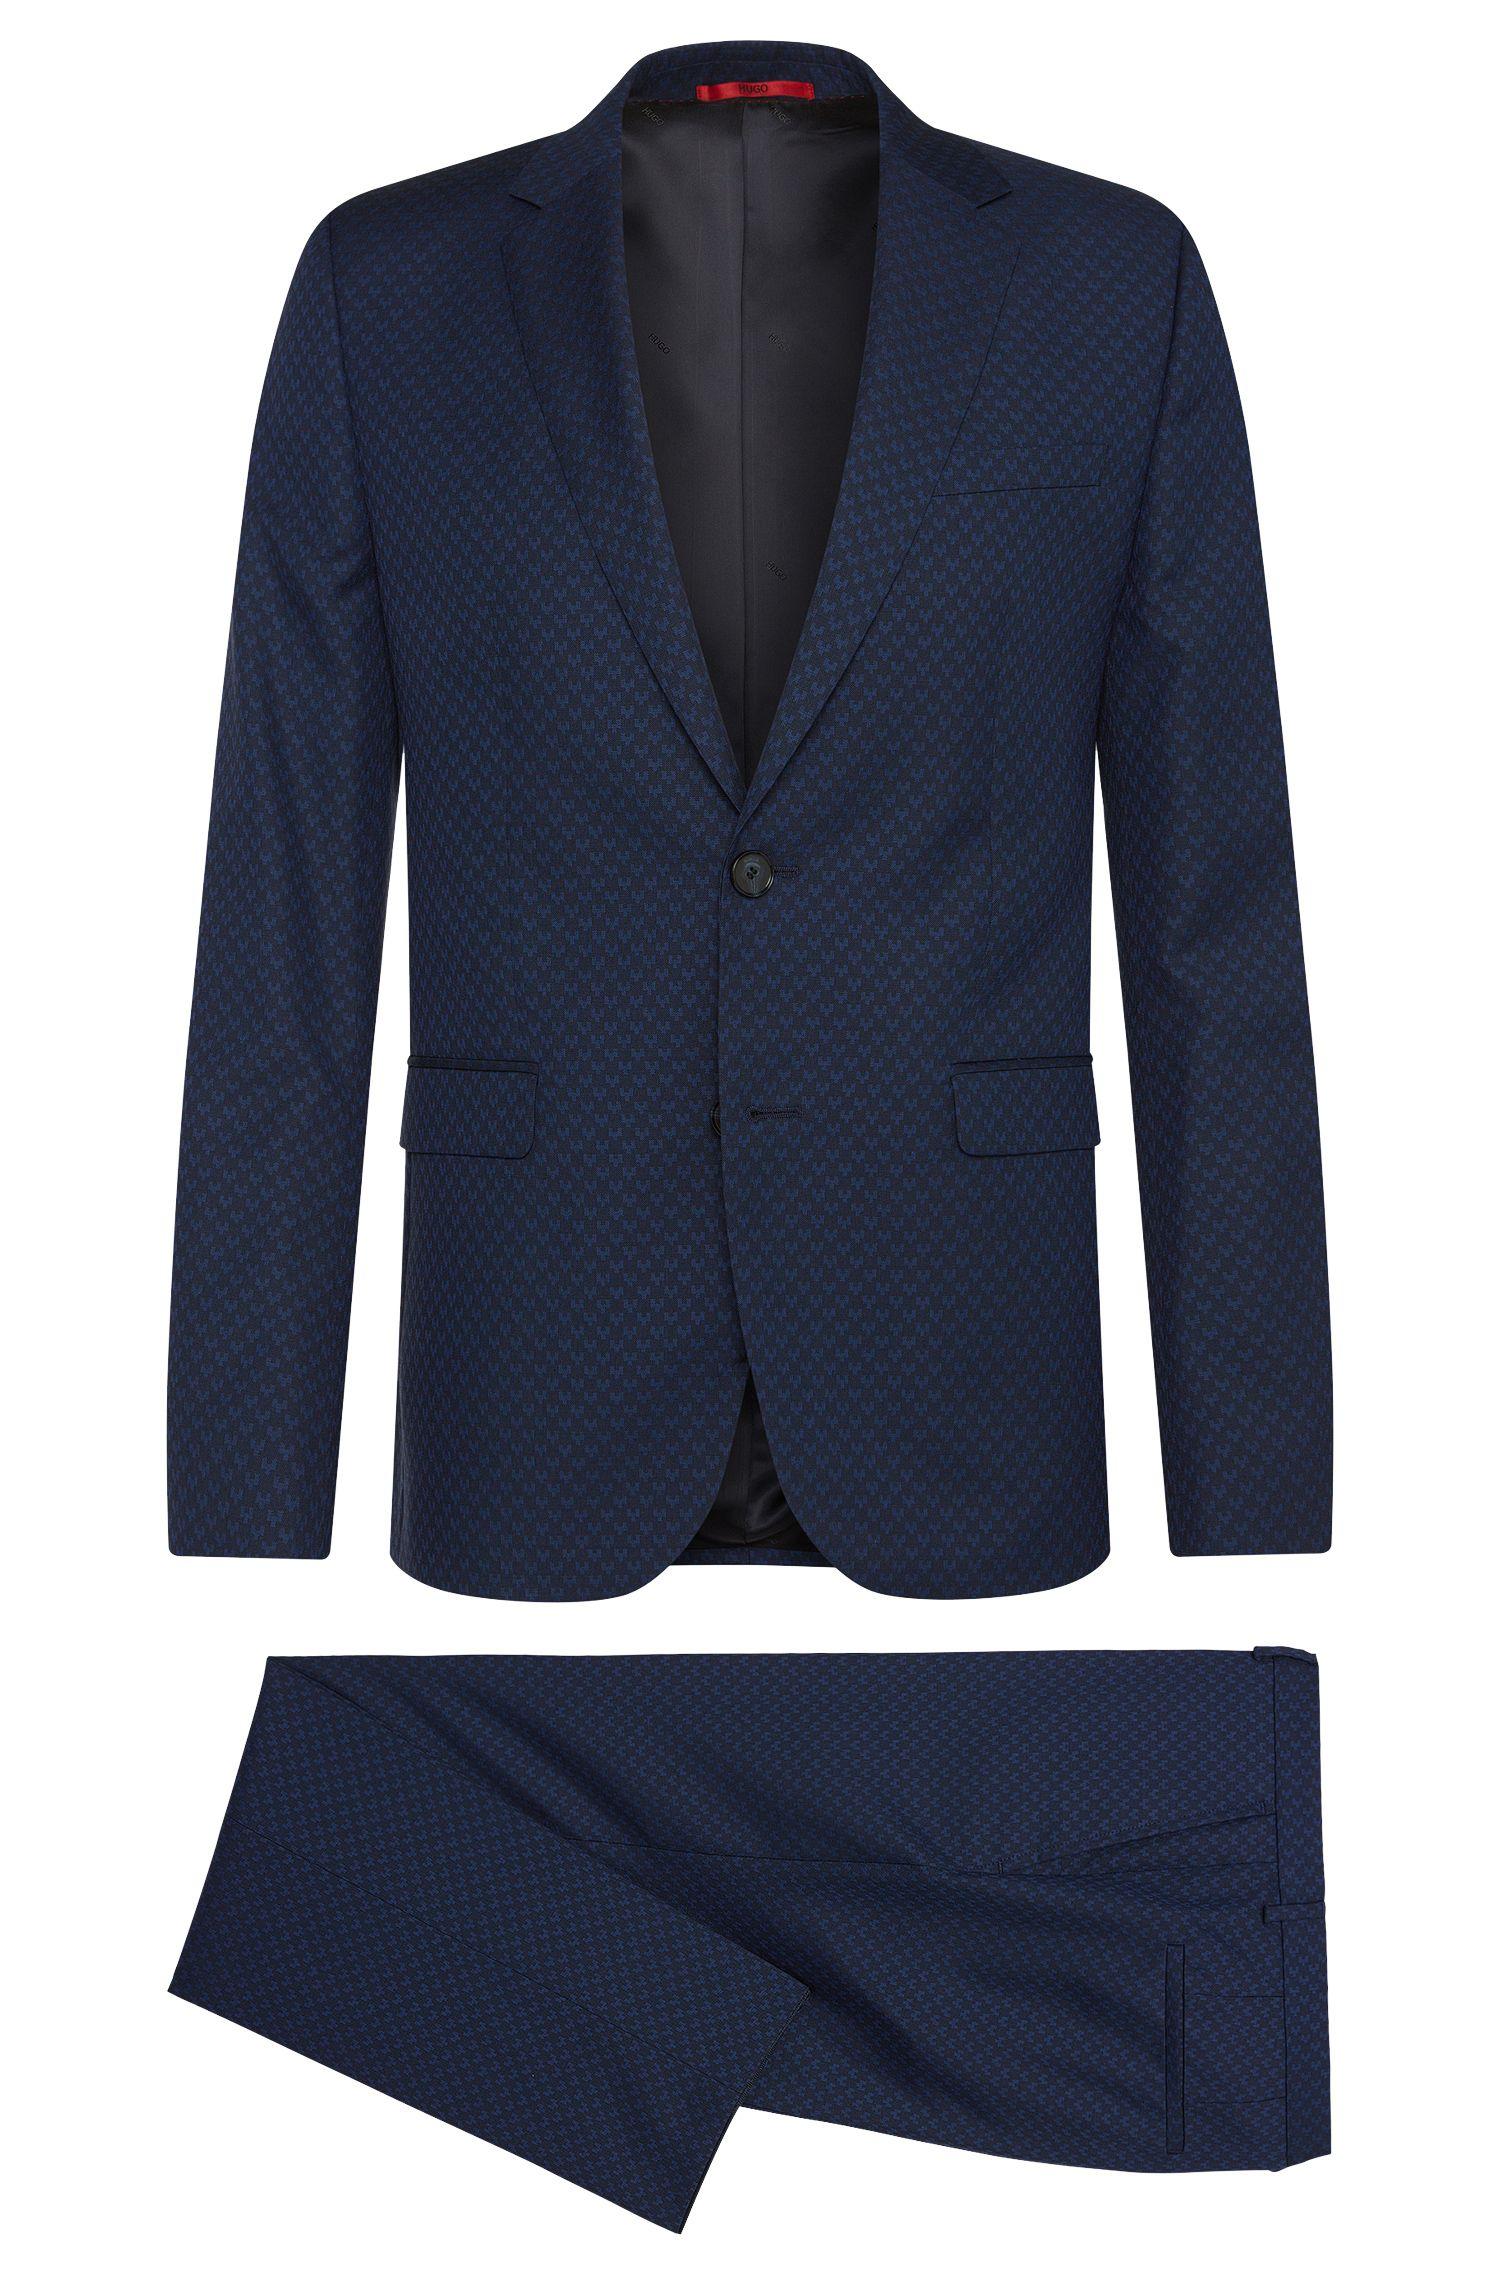 Dobby Virgin Wool Cotton Patterned Suit, Slim Fit | Astian/Hets